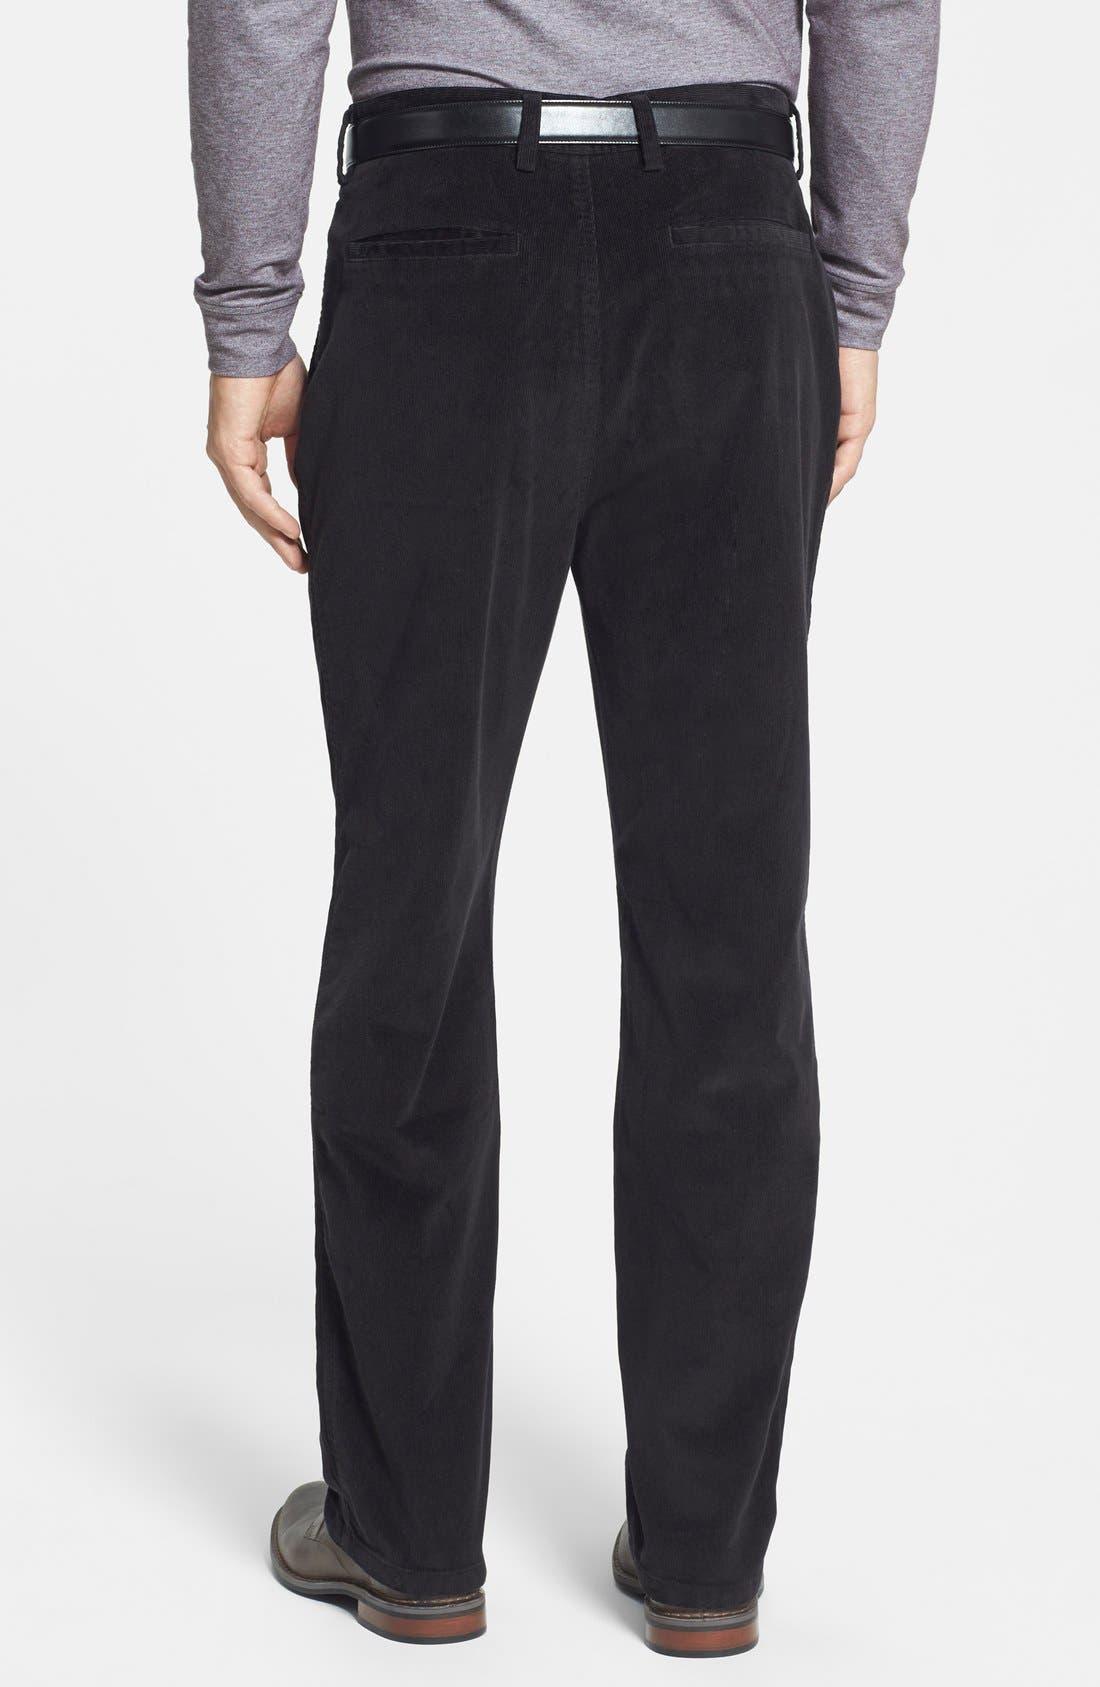 'Walker' Flat Front Straight Leg Corduroy Pants,                             Alternate thumbnail 3, color,                             001